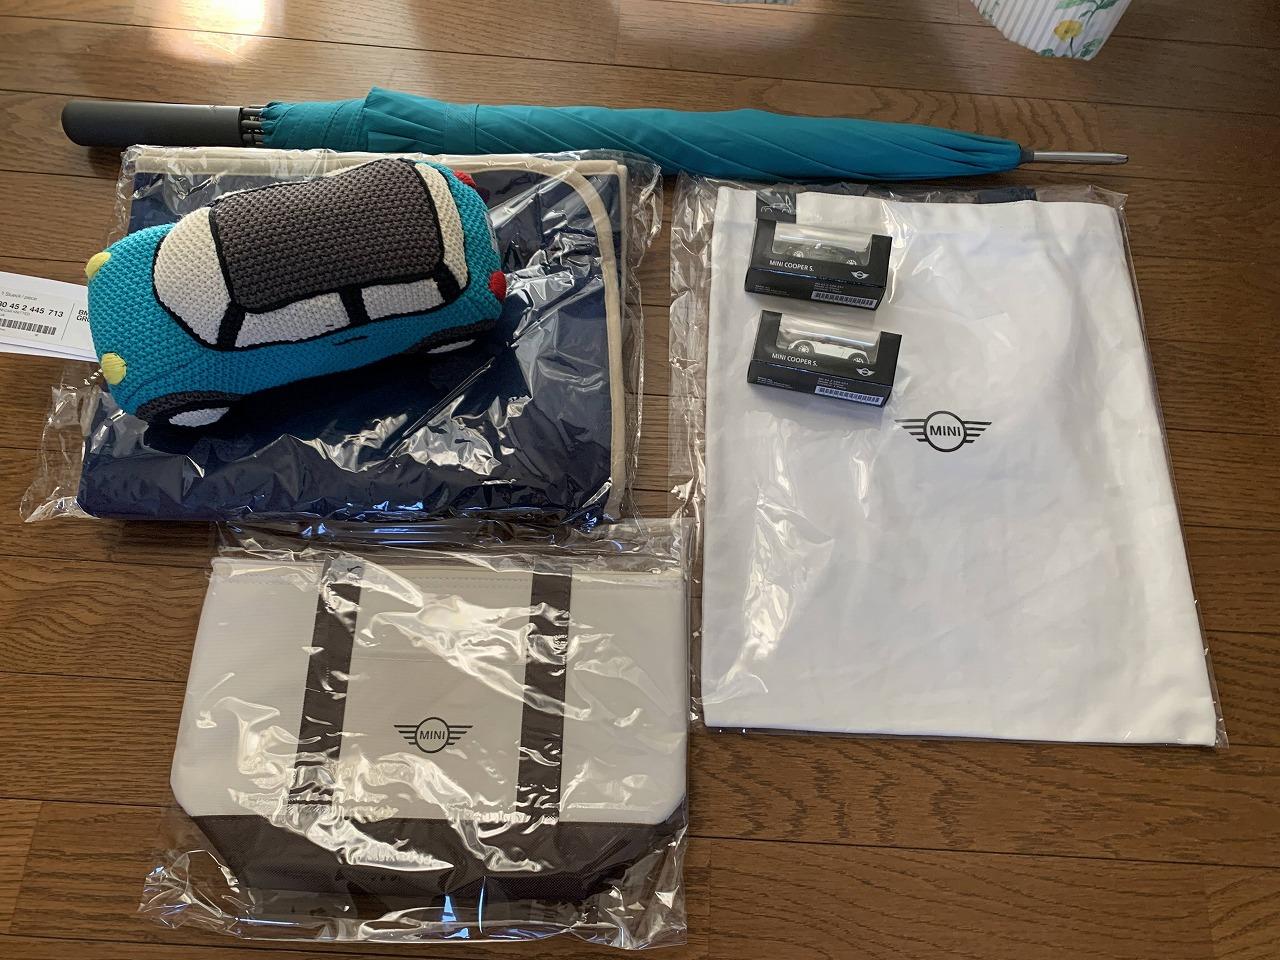 2019BMW MINI福袋(Lucky bag)7000円の中身の開封レポート♪